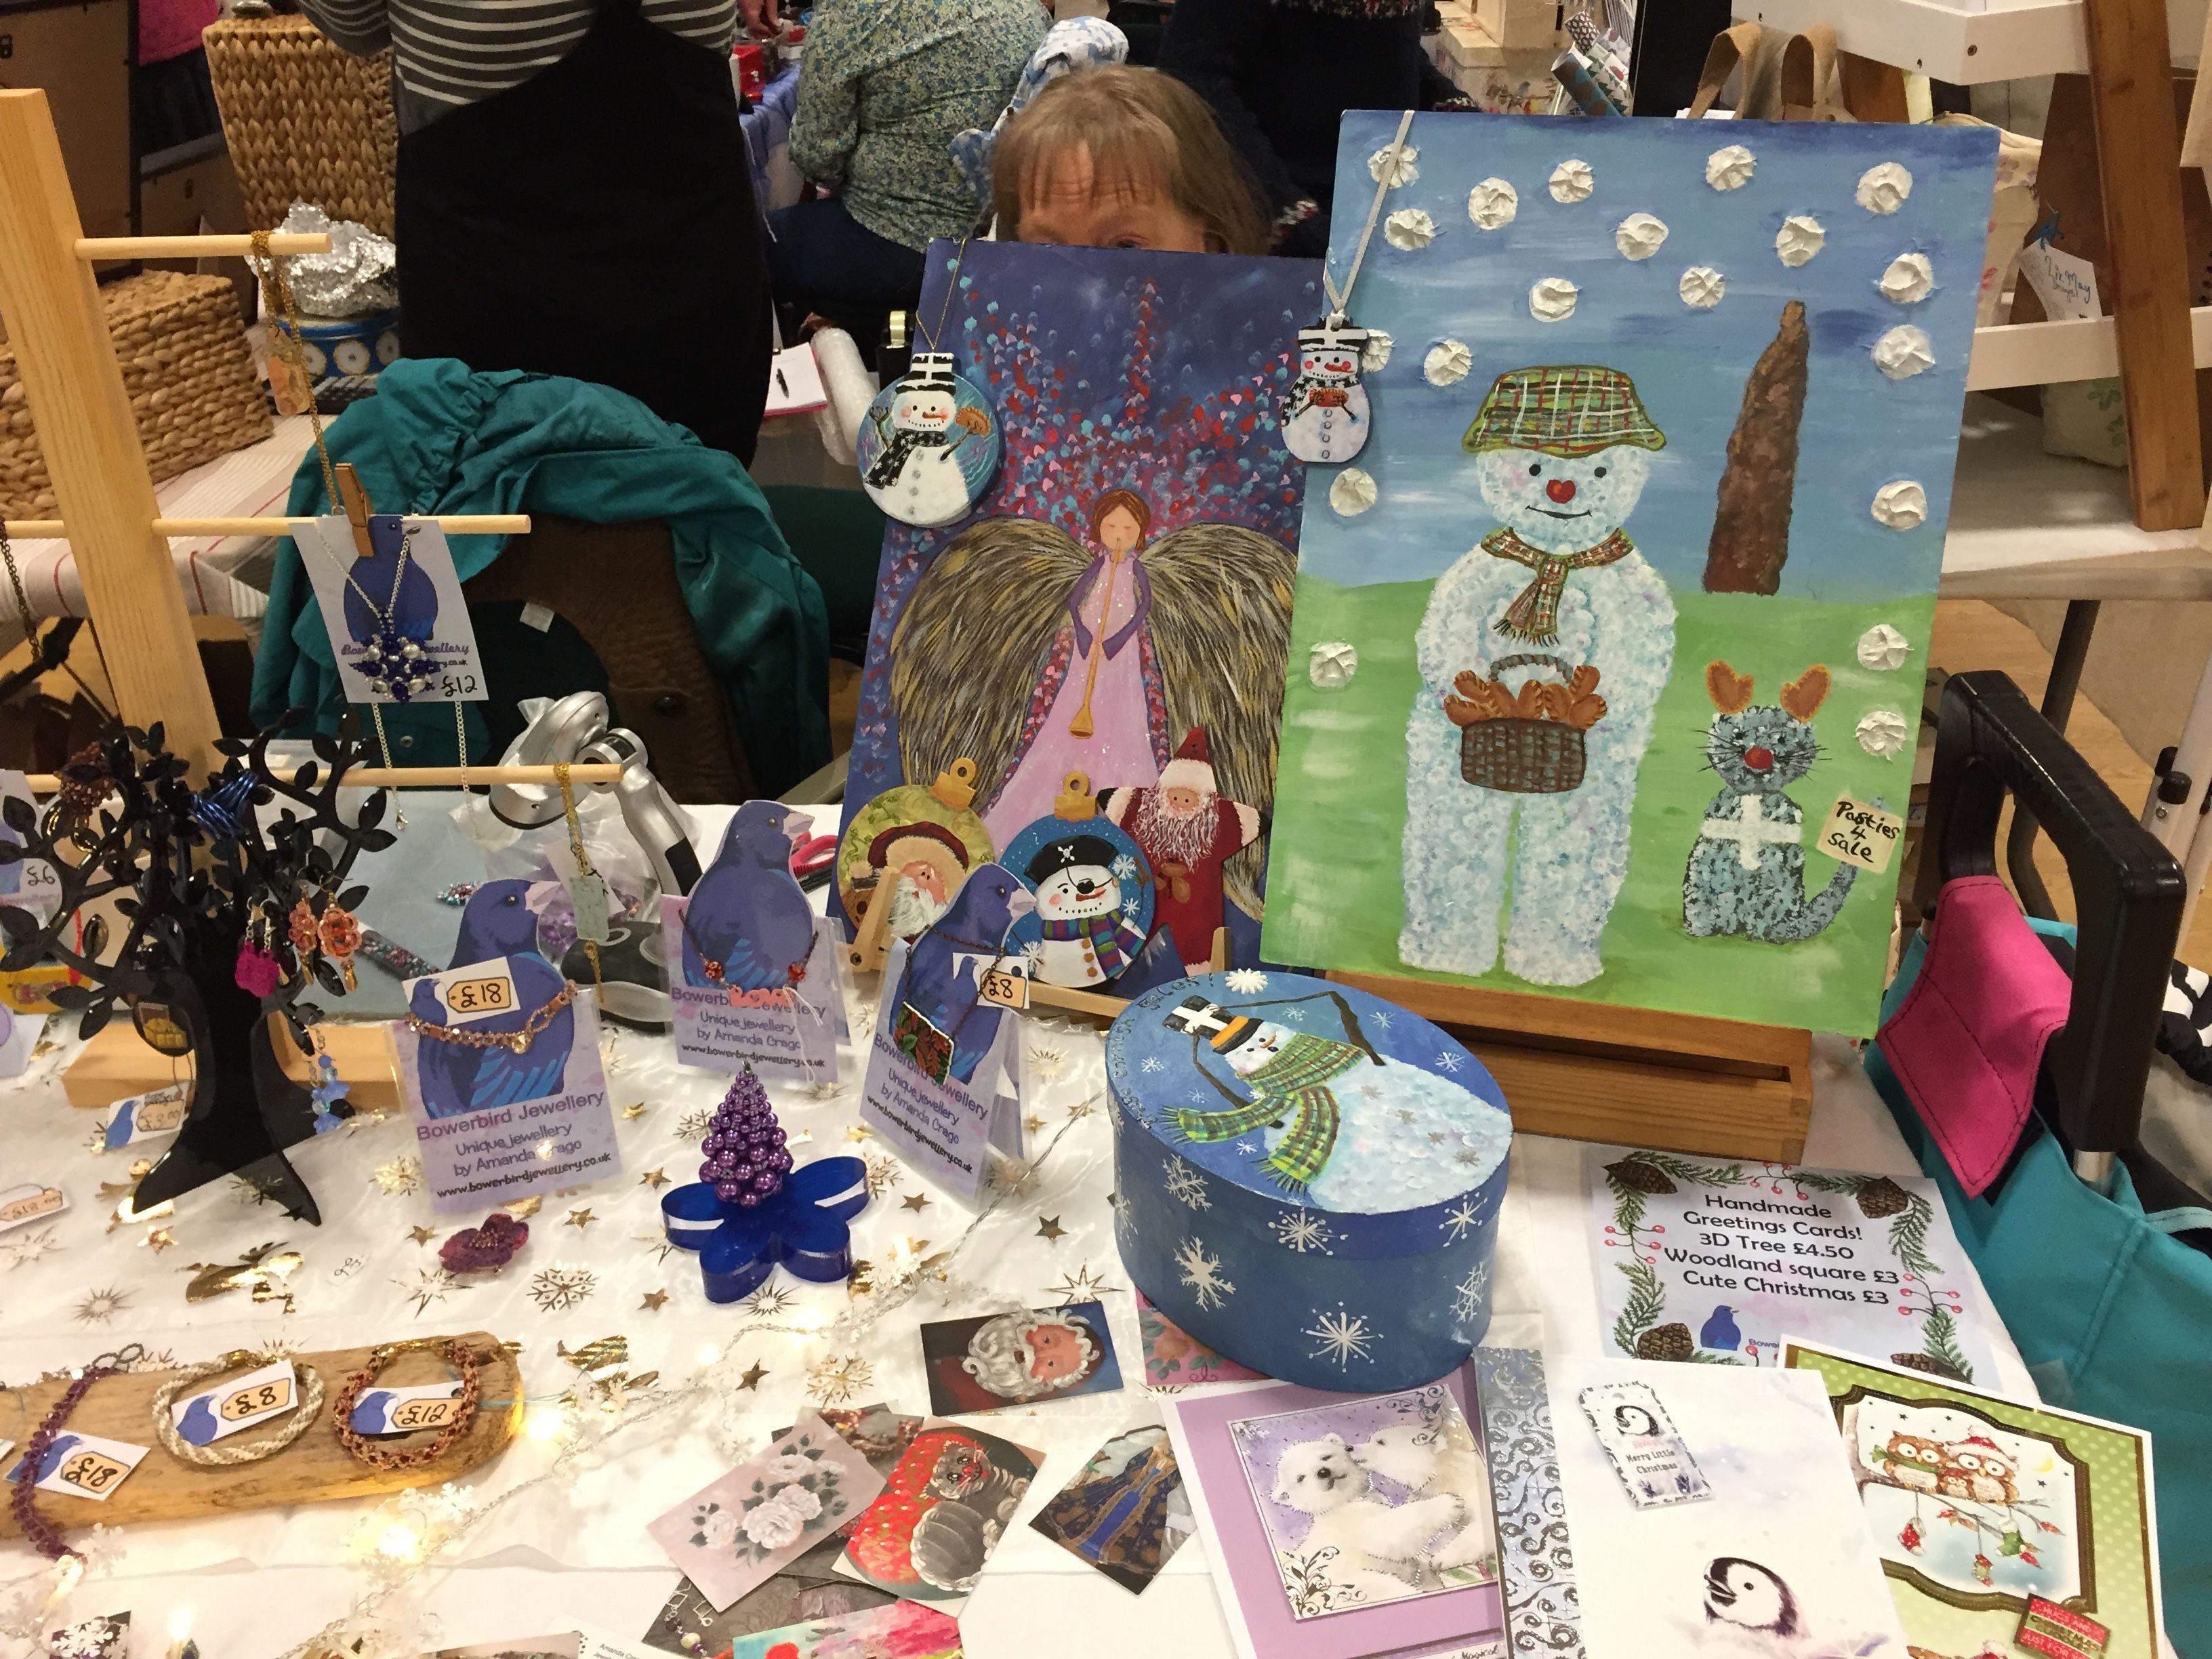 Hellys Craft Fair December 2016 Local Craft Fairs Craft Fairs